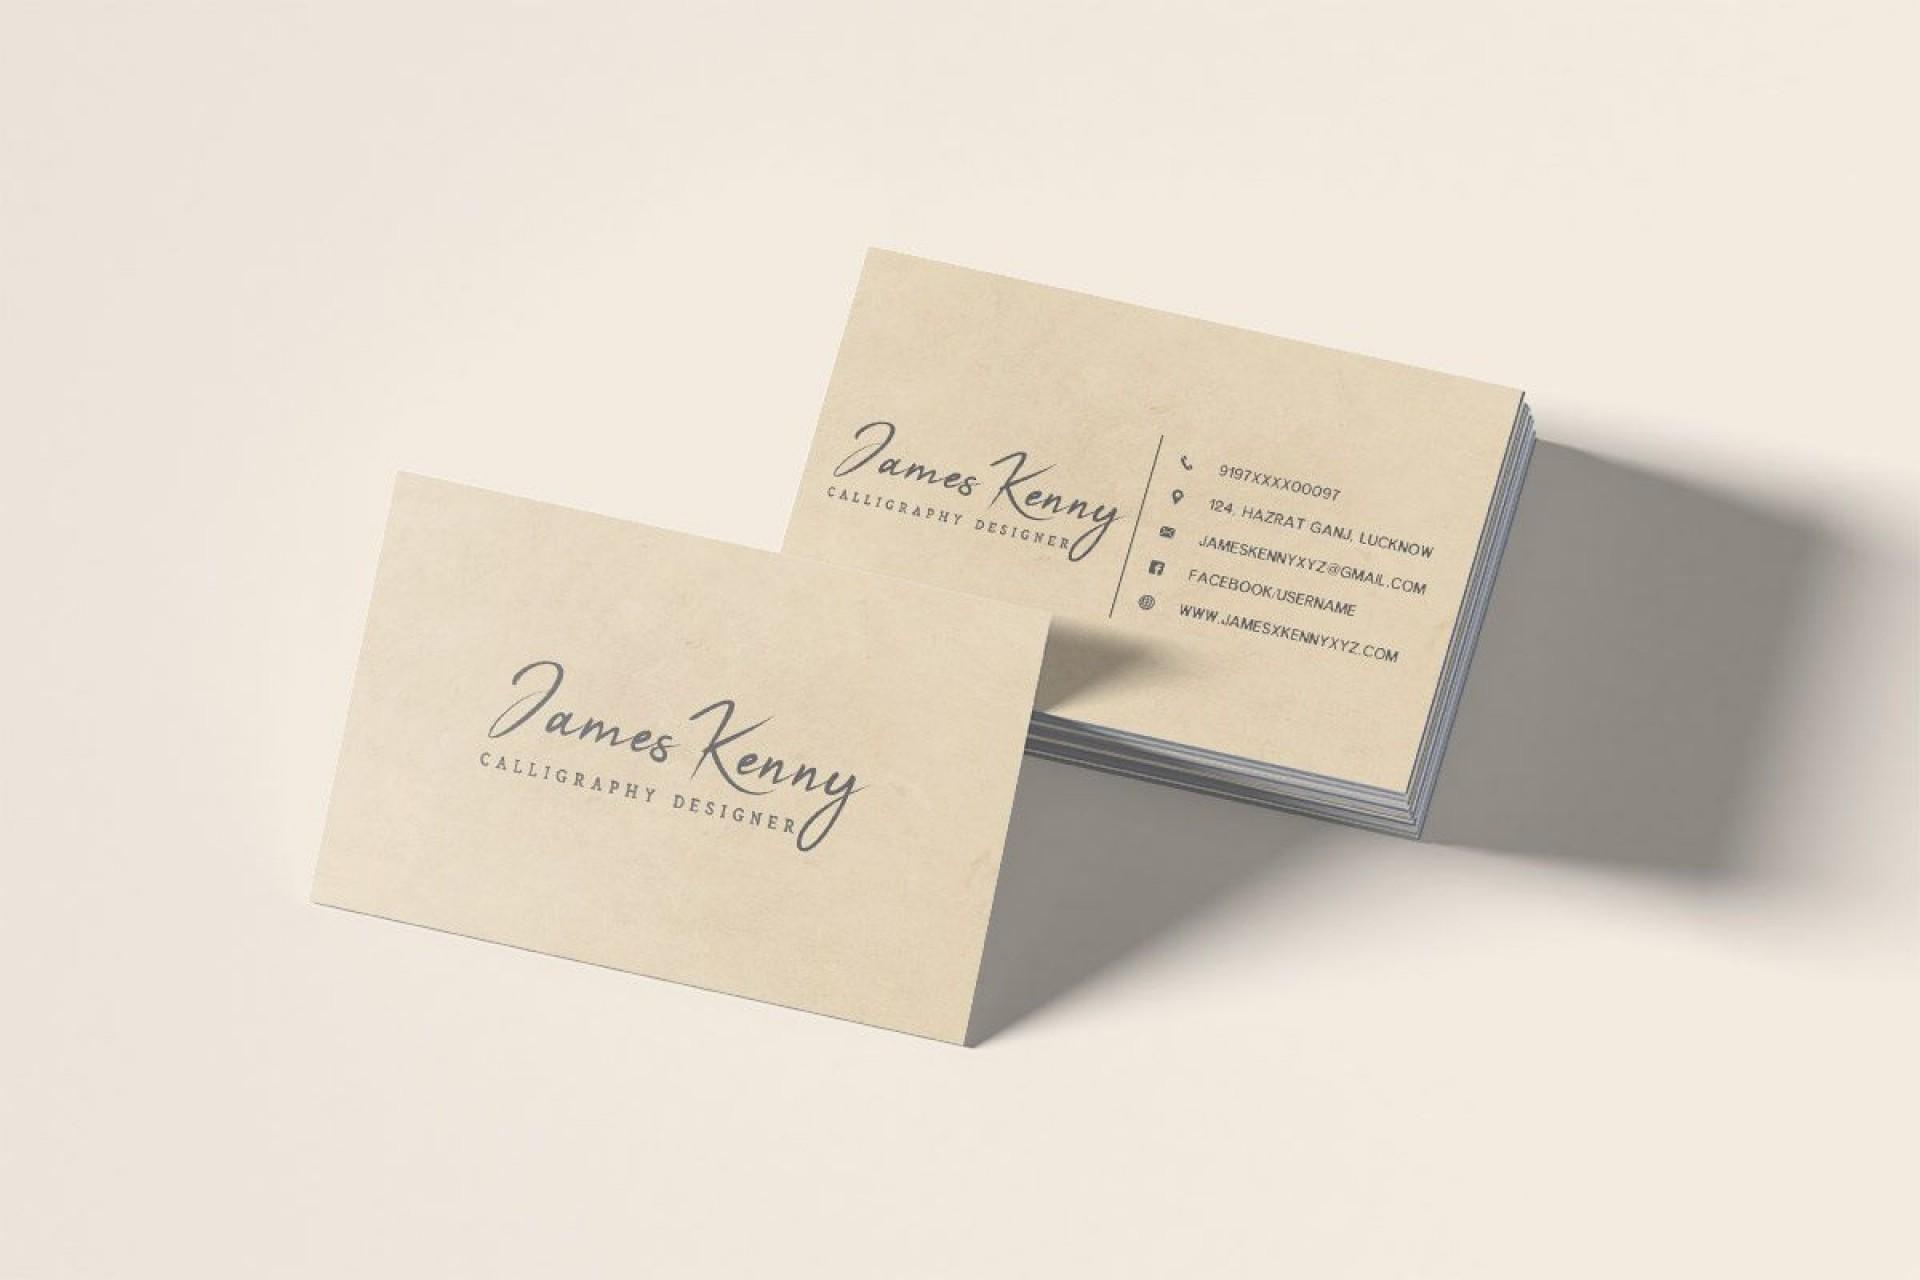 008 Wondrou Minimal Busines Card Template Free Download Design  Simple Coreldraw1920